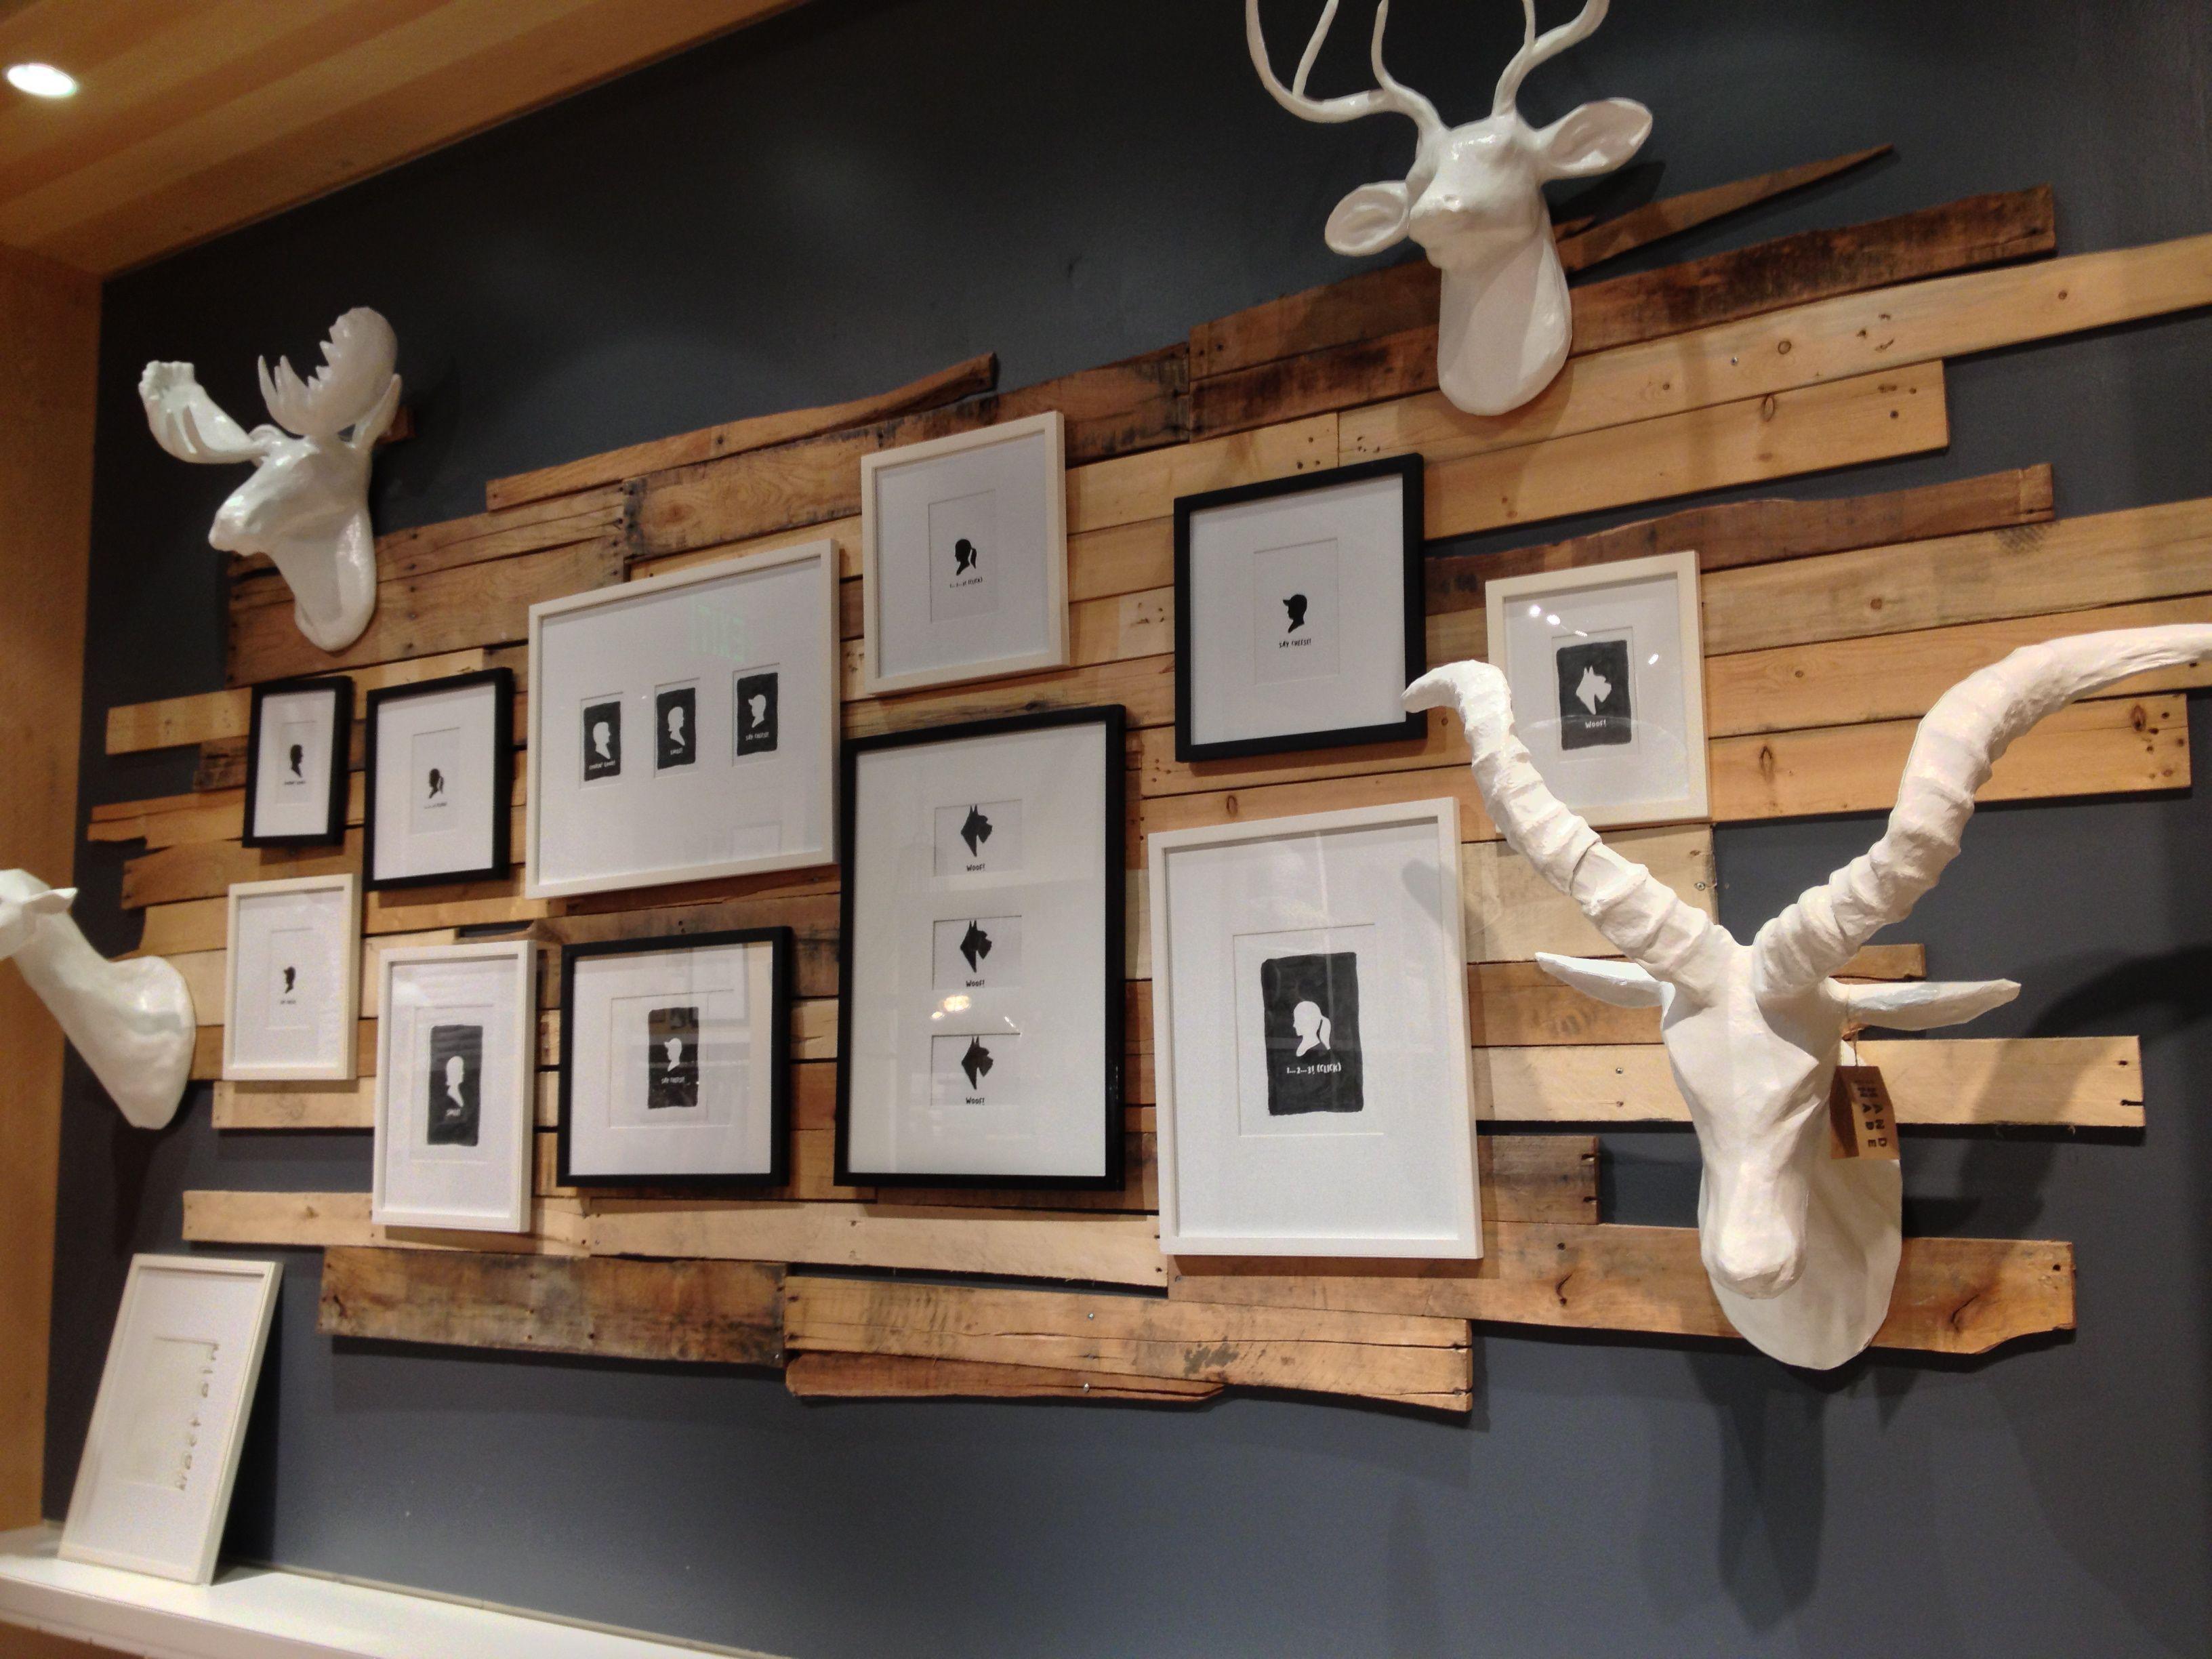 west elm plank photo wall finished basement ideas pinterest